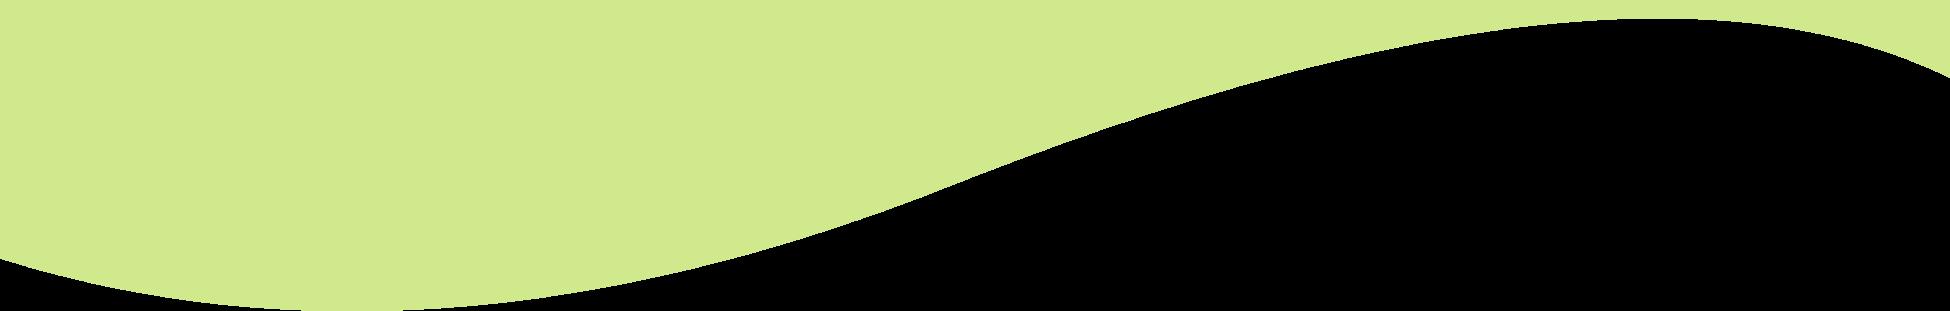 Wavy Green Line